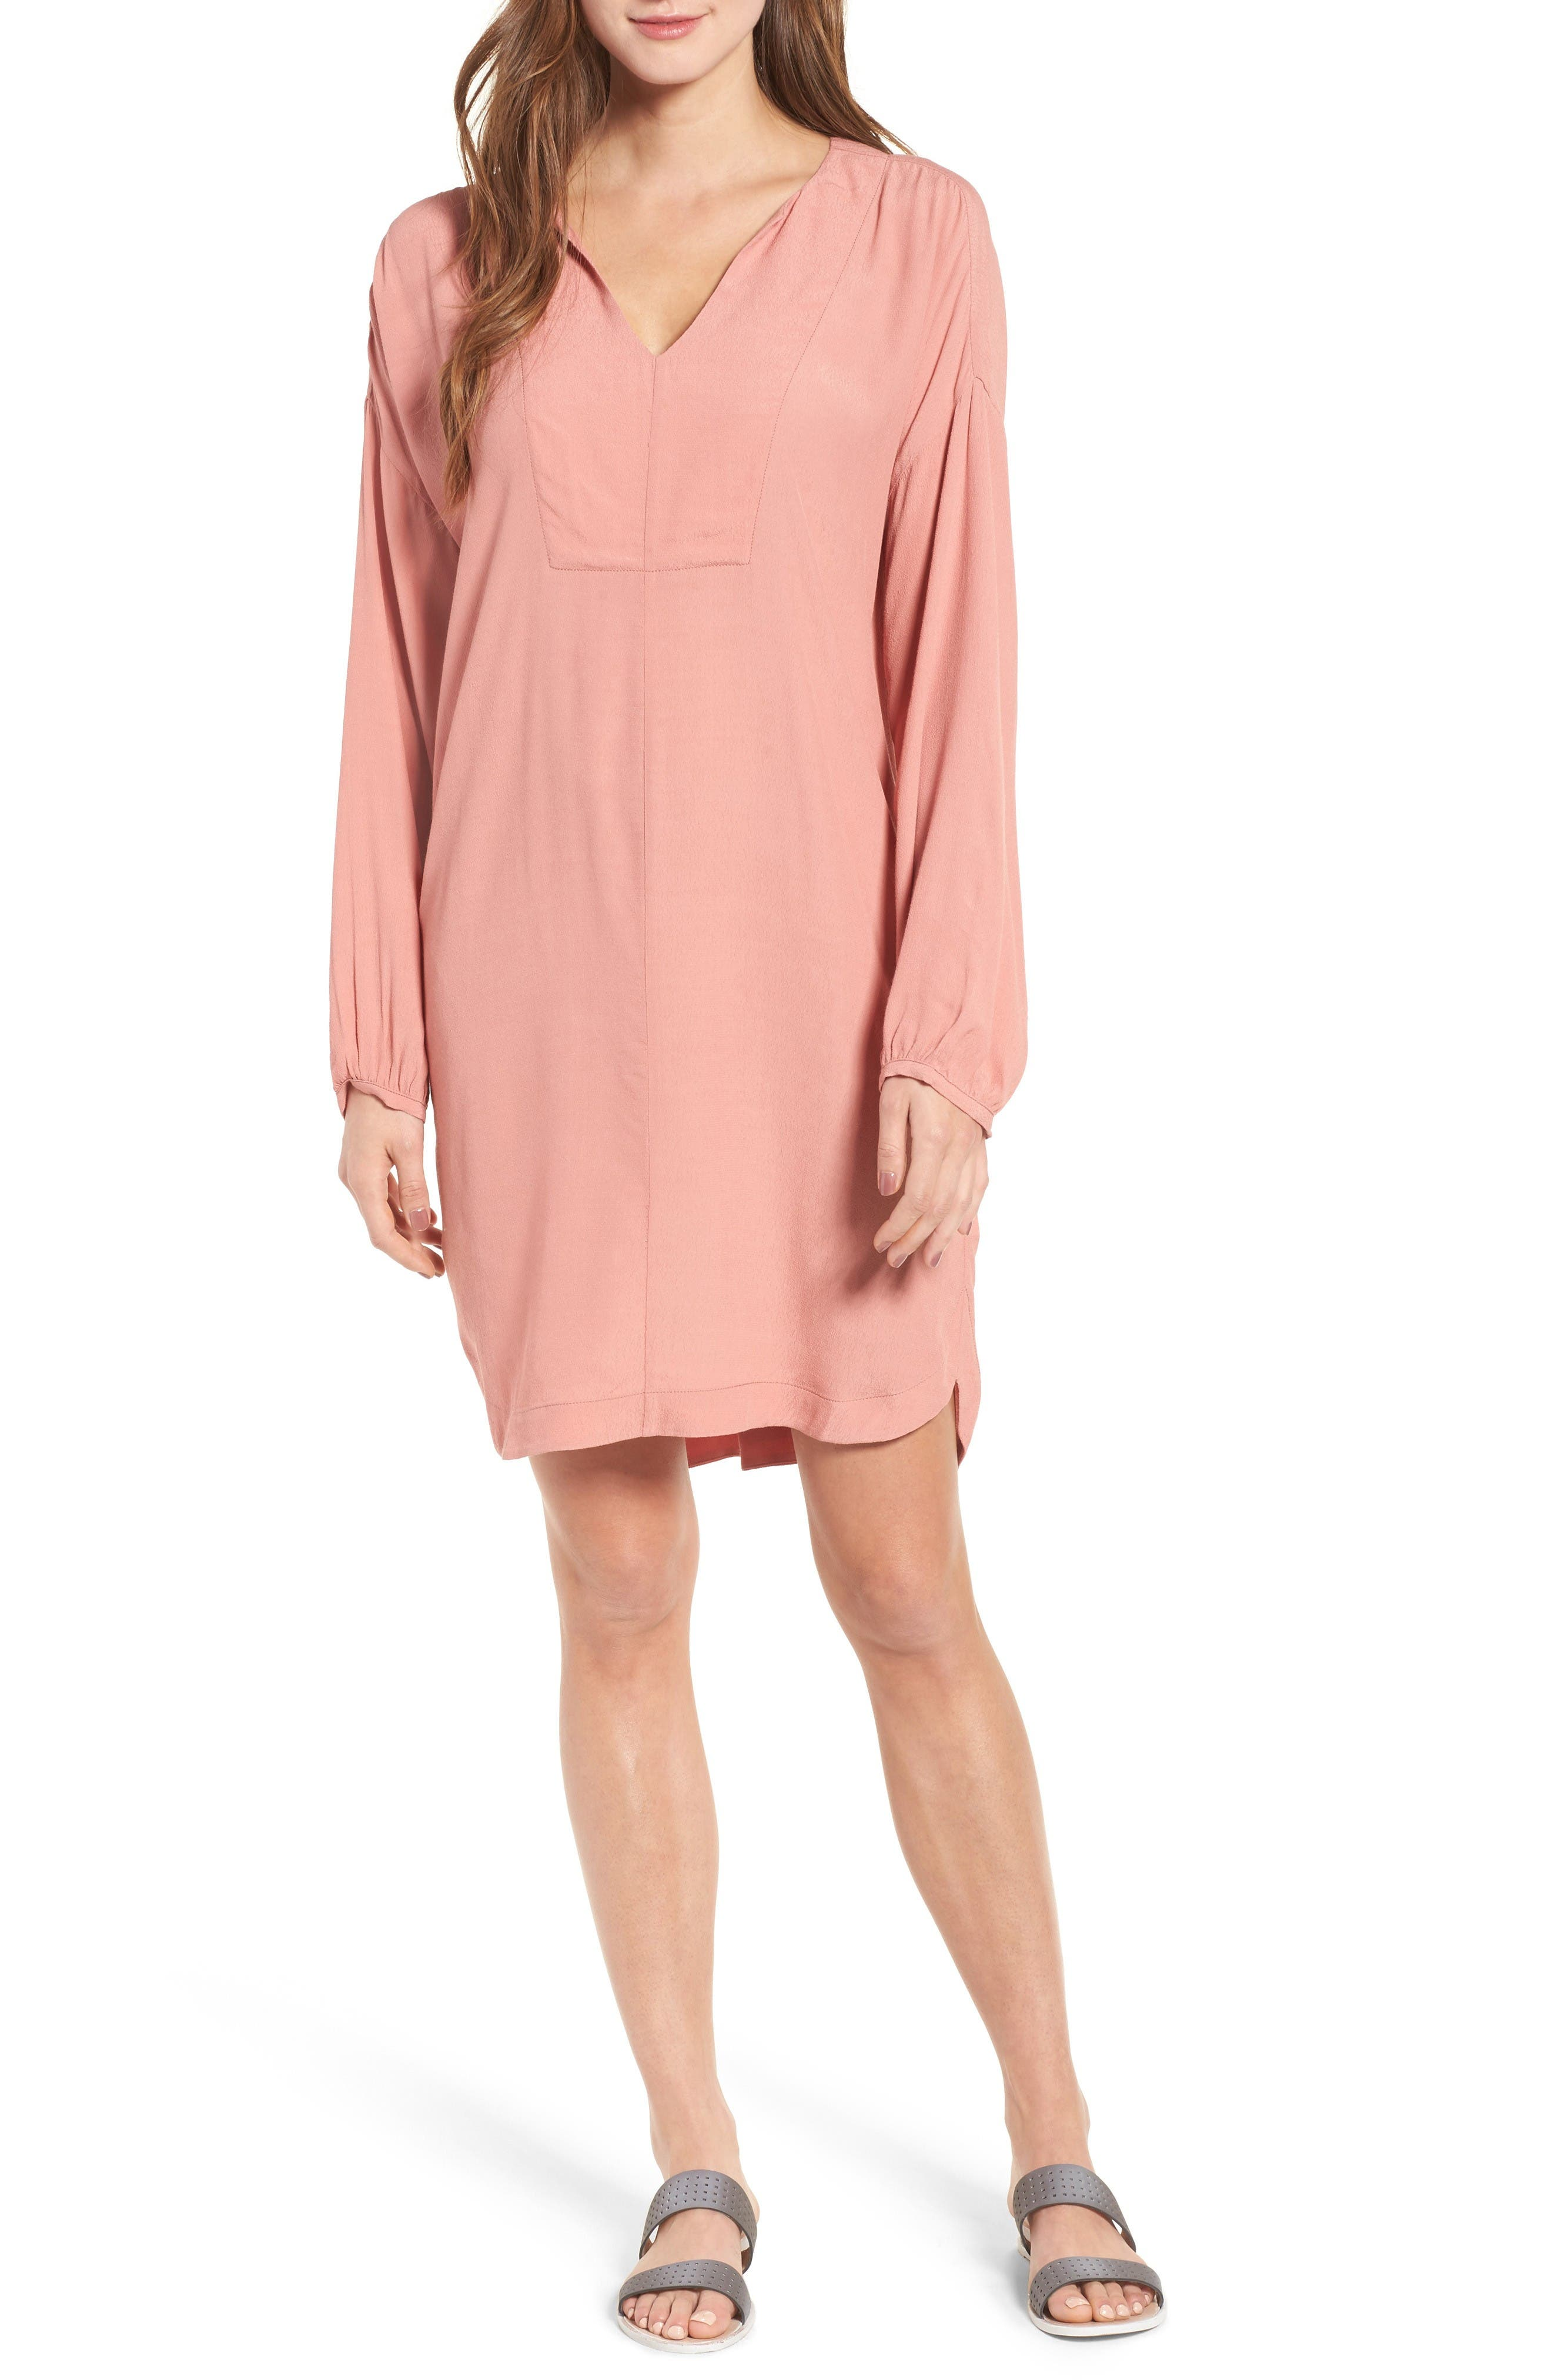 Alternate Image 1 Selected - Madewell Du Jour Tunic Dress